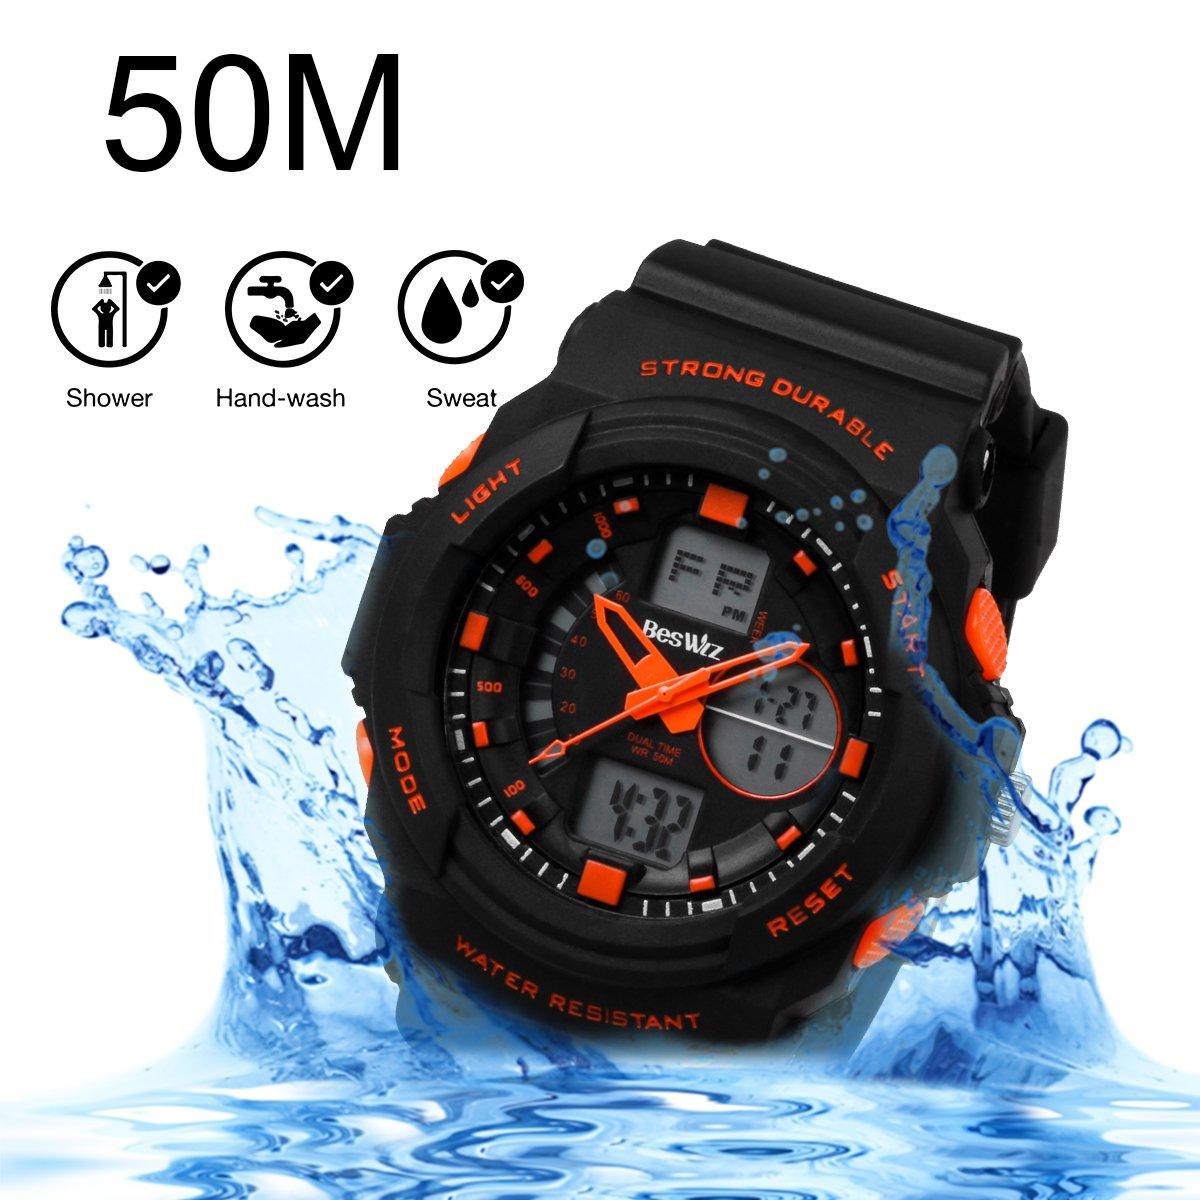 BesWLZ Multi Function Digital LED Quartz Watch Water Resistant Electronic Sport Watches Child Orange by BesWlz (Image #4)